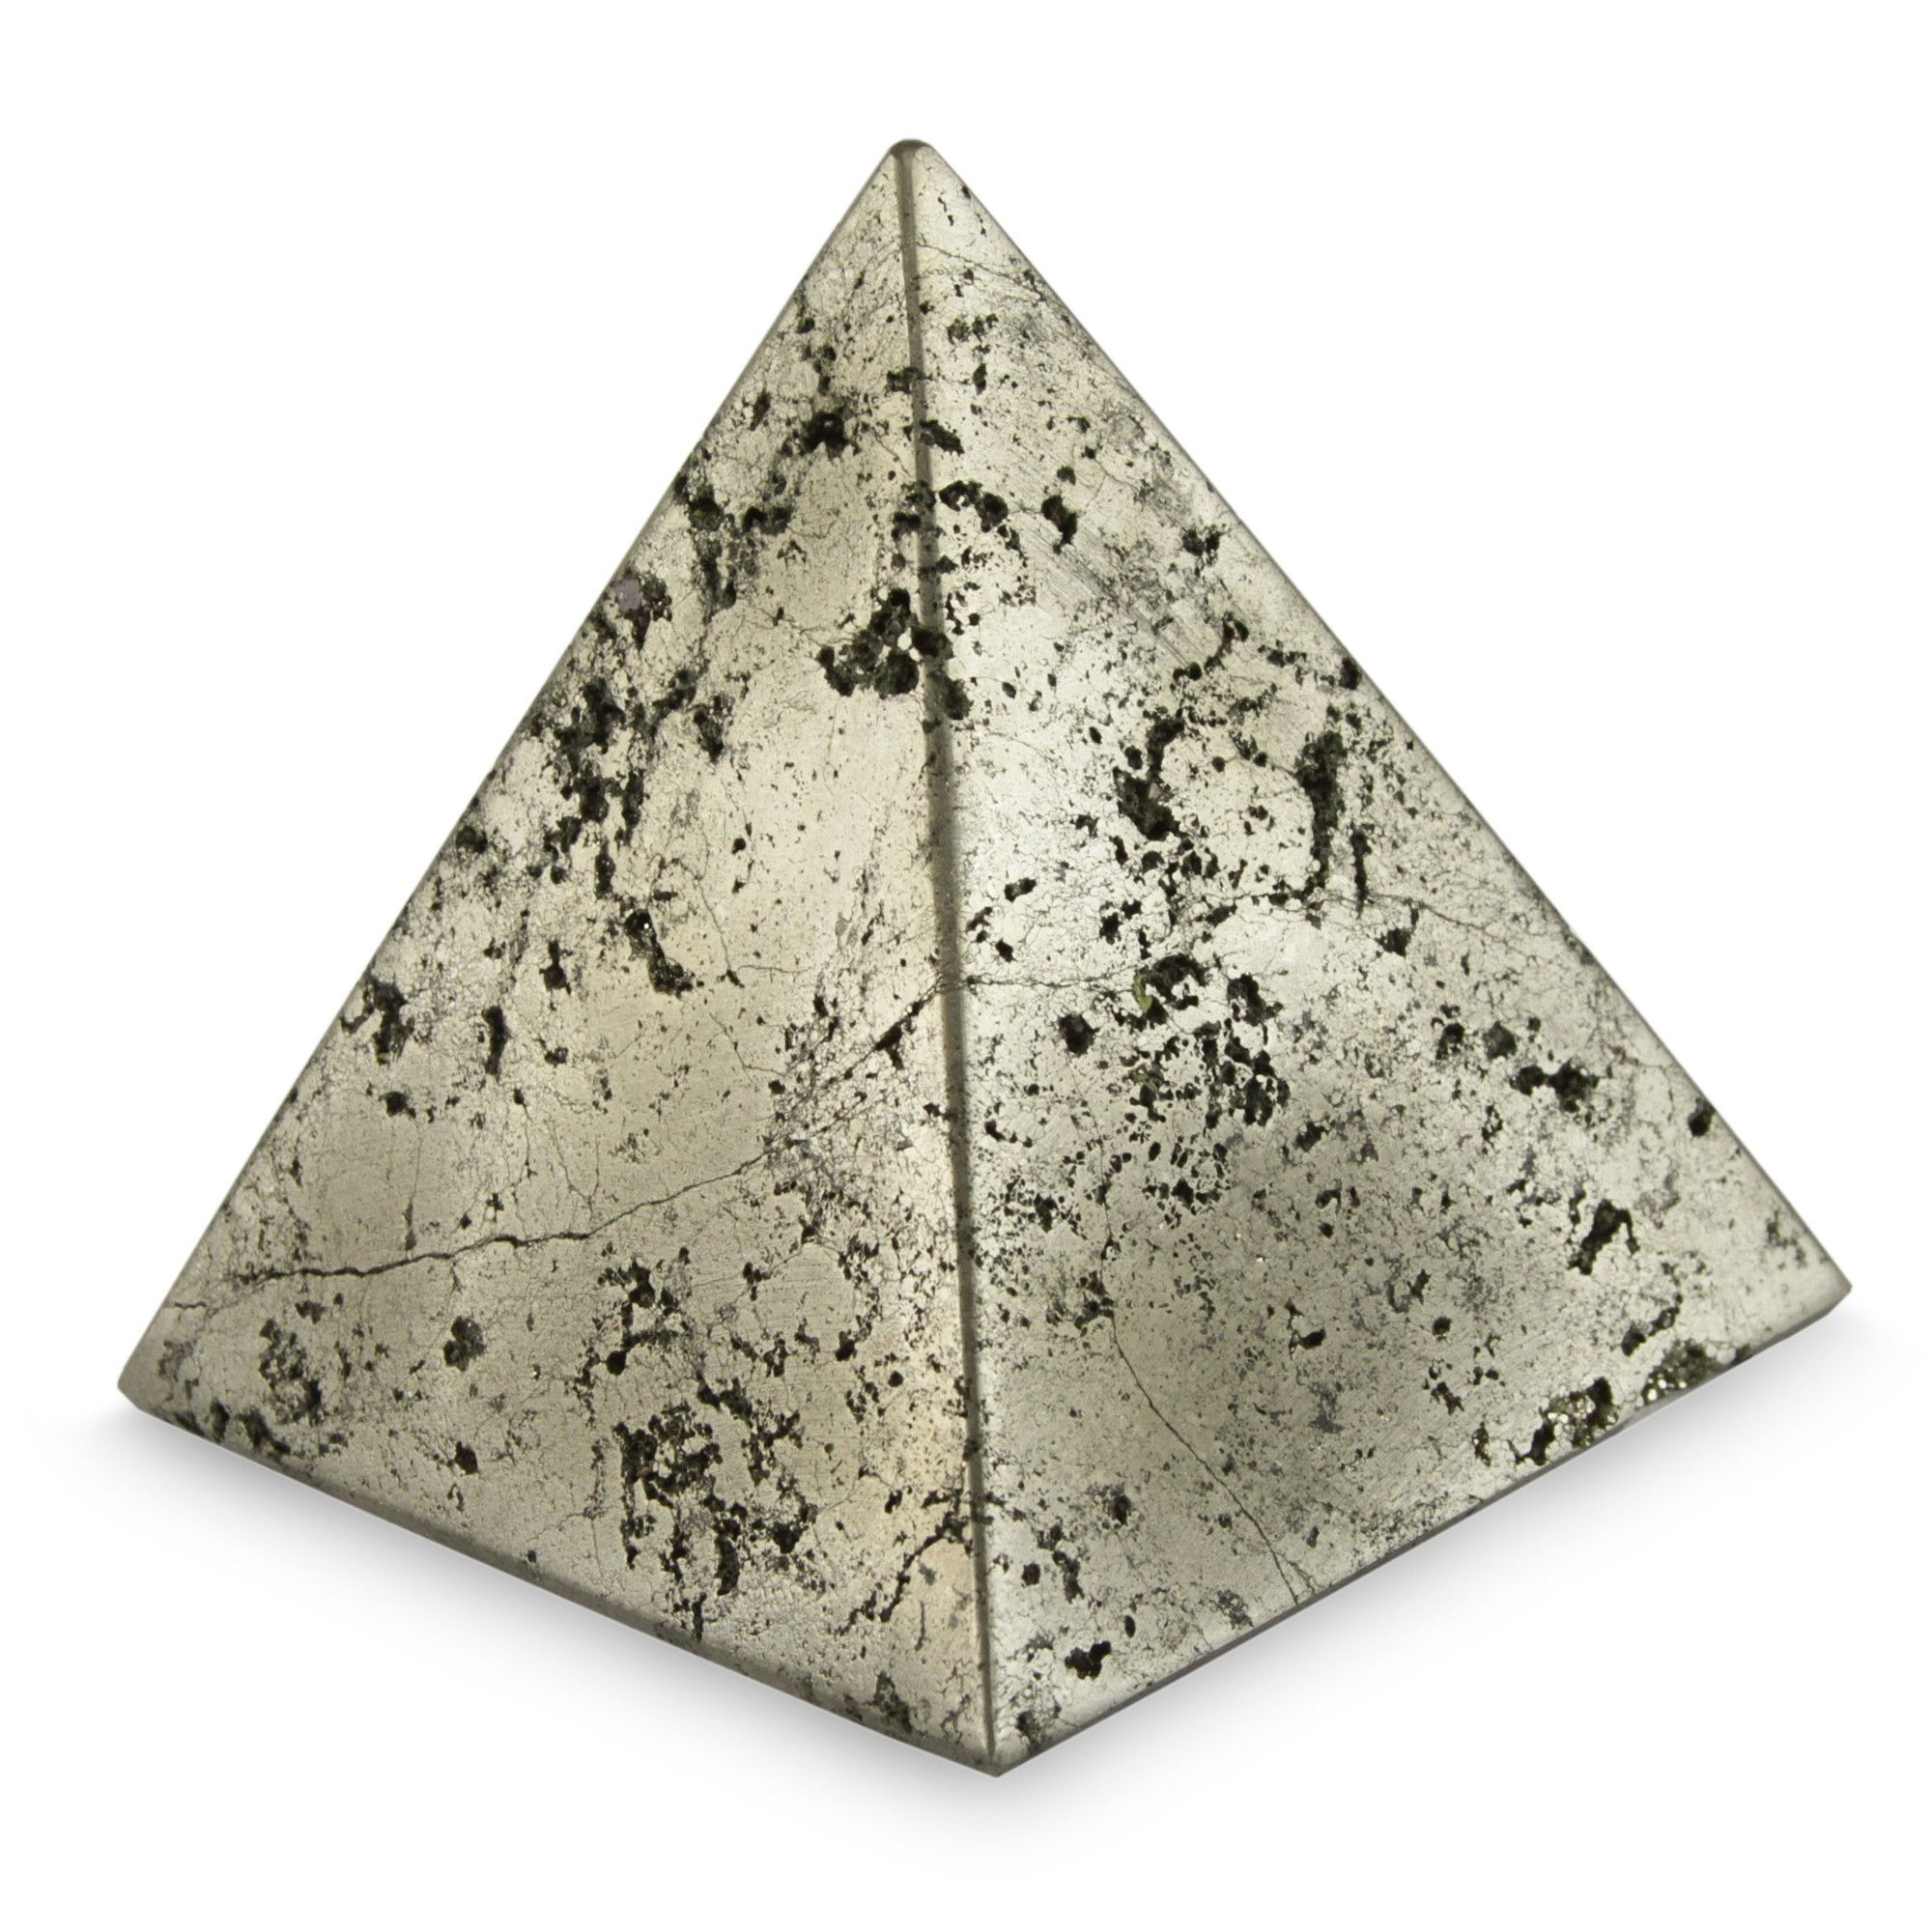 Pyramid of Prosperity Sculpture